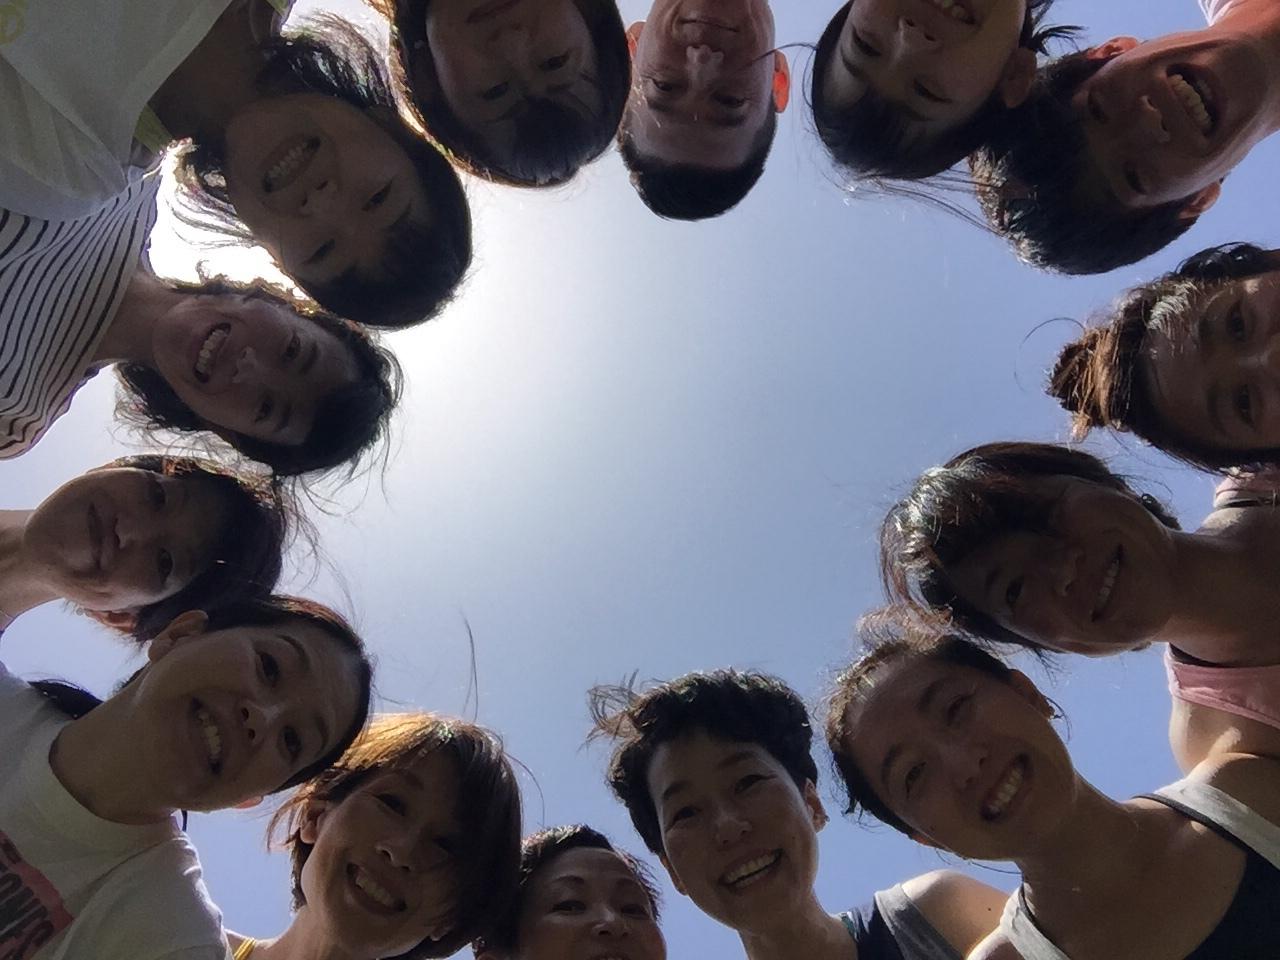 Beach mayu yoga 2018  7月からの日程です♫_a0267845_13385840.jpg